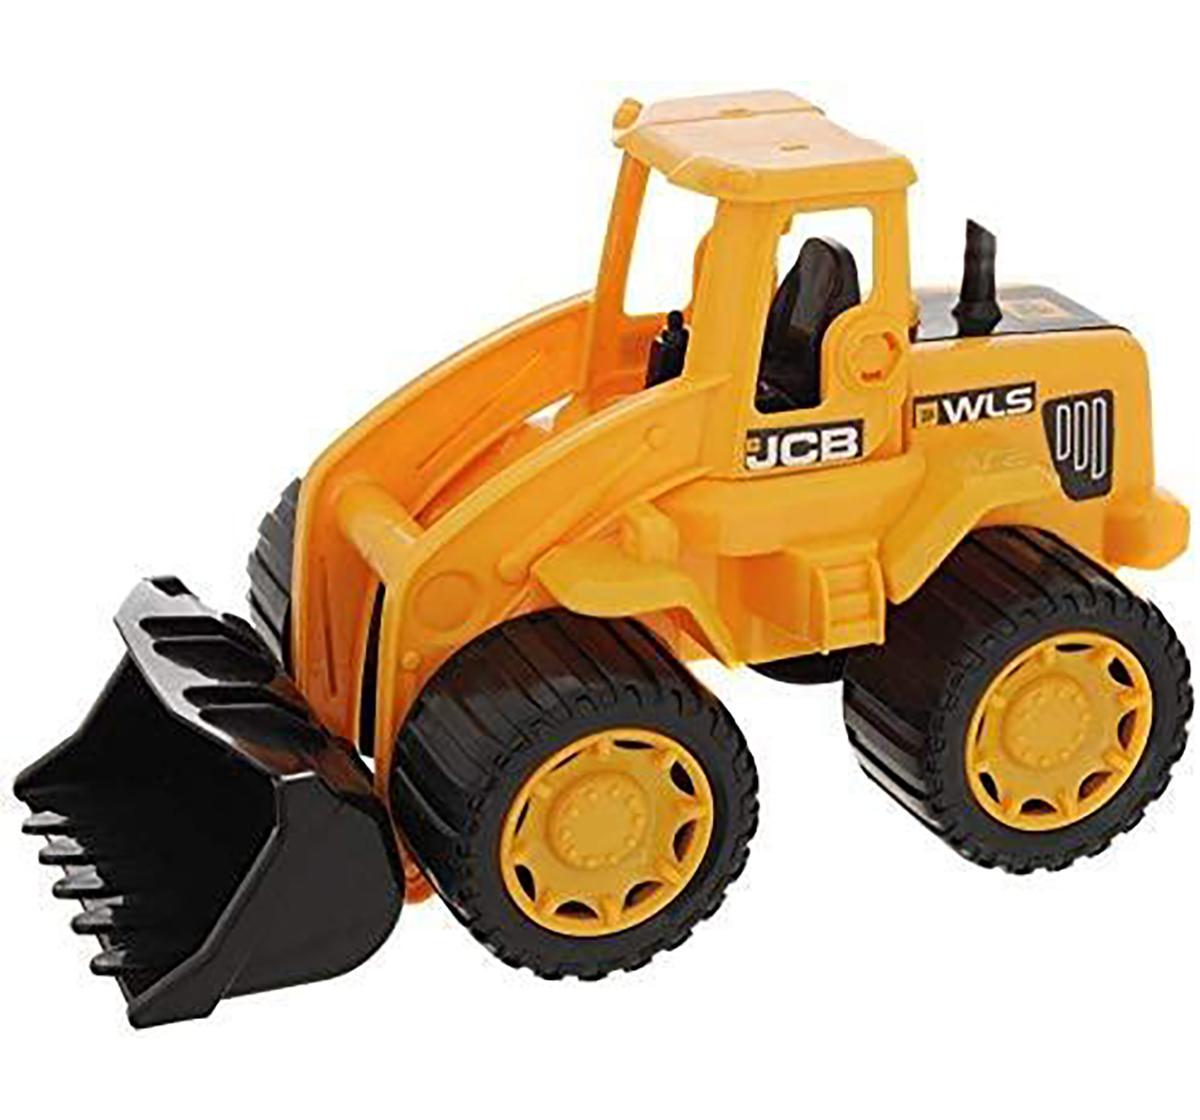 "Ralleyz   Ralleyz 14"" WHEEL LOADER Vehicles for Kids age 3Y+"